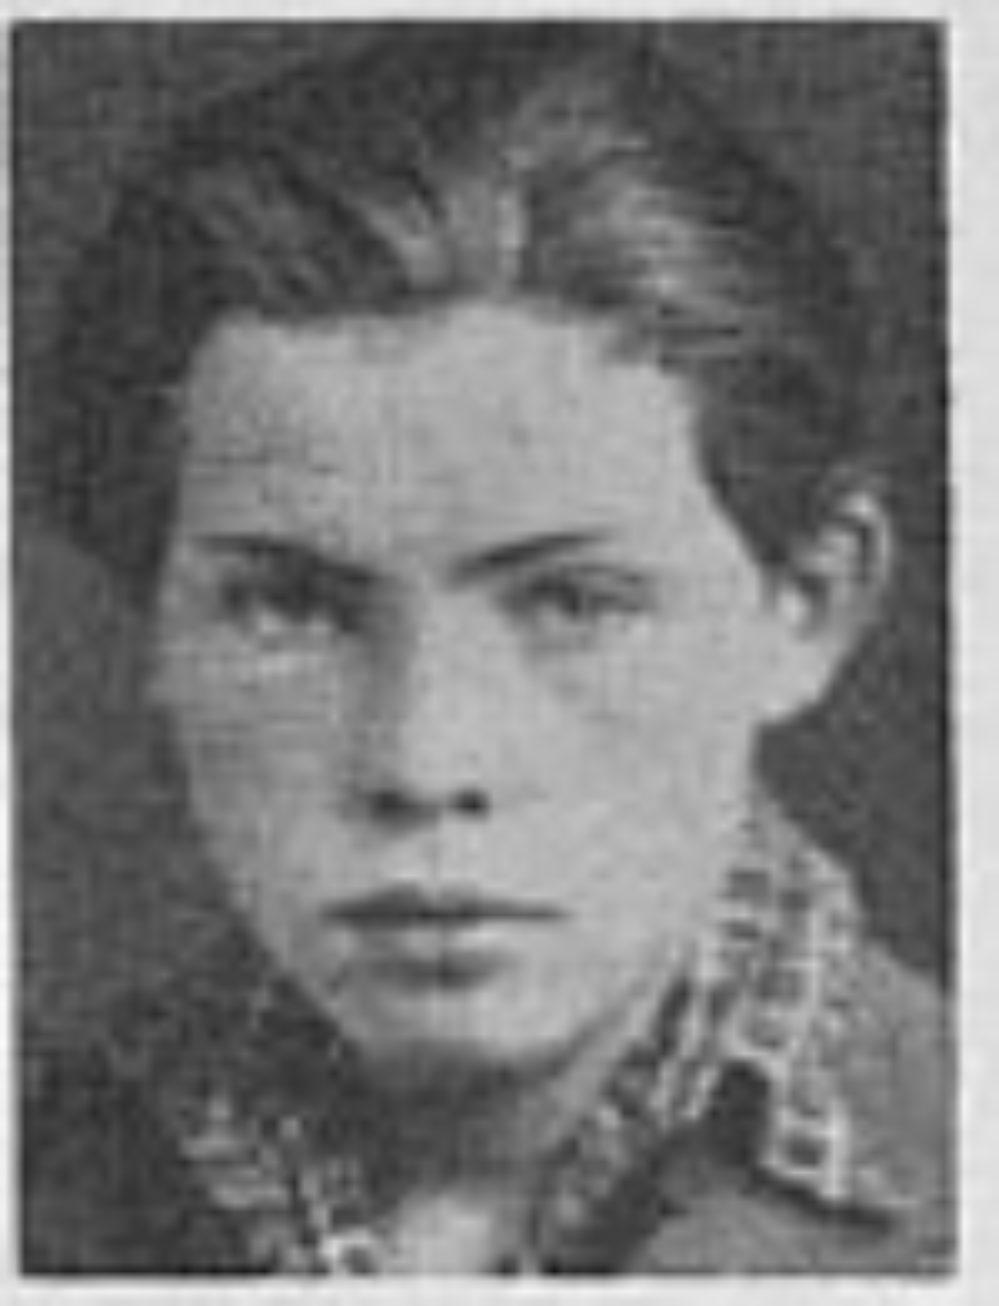 Einar Anker Thevik